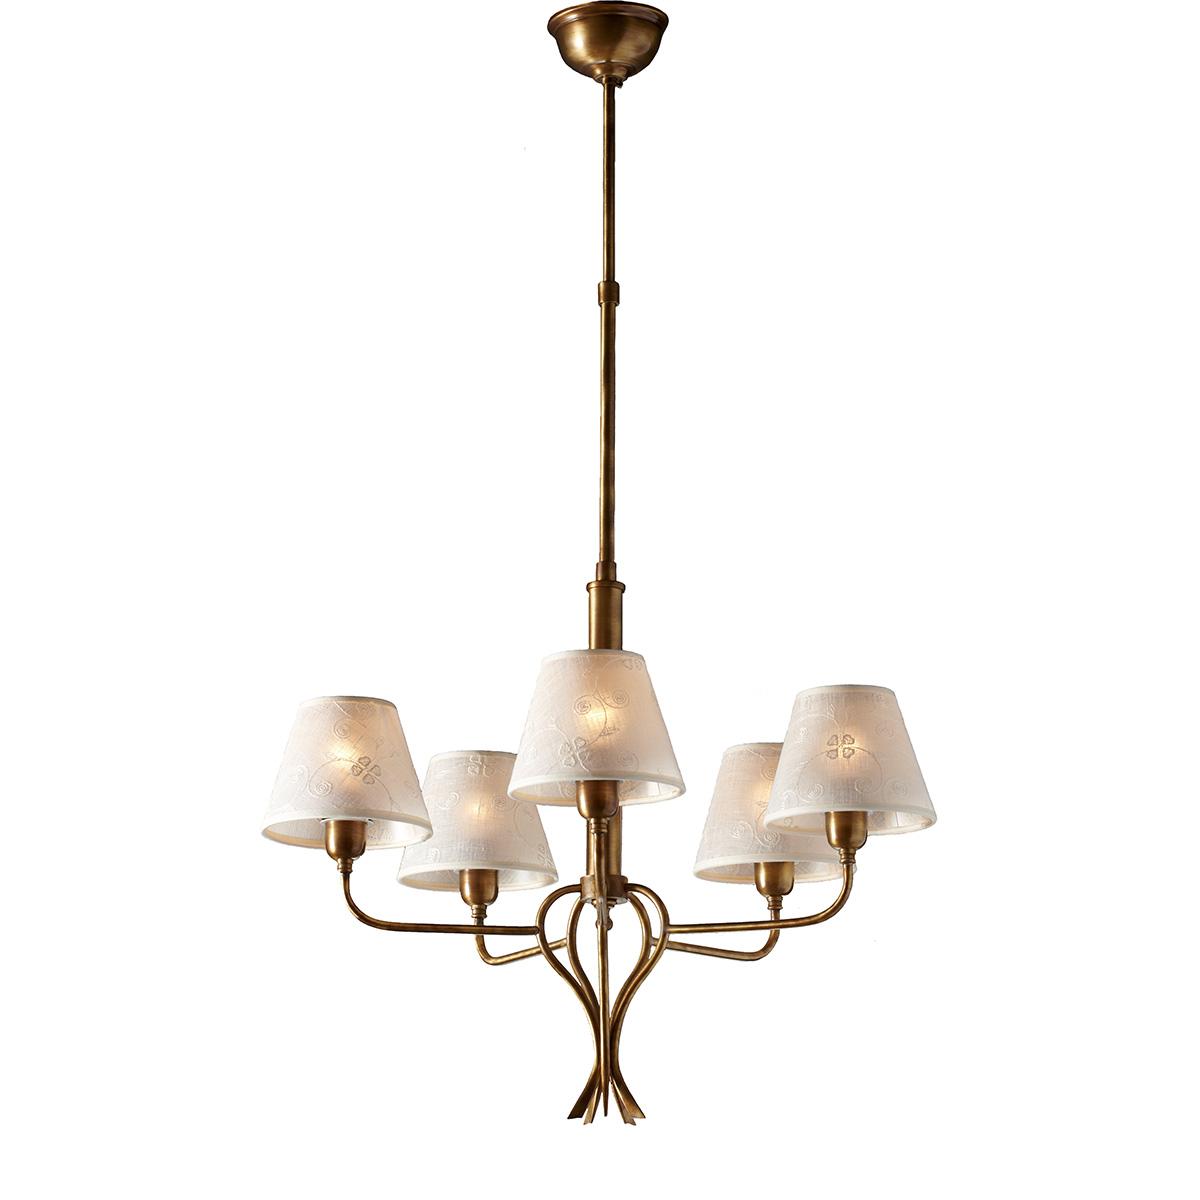 Classic 5 Bulb Chandelier With Shades Elati Mavros Diagram Elati5003